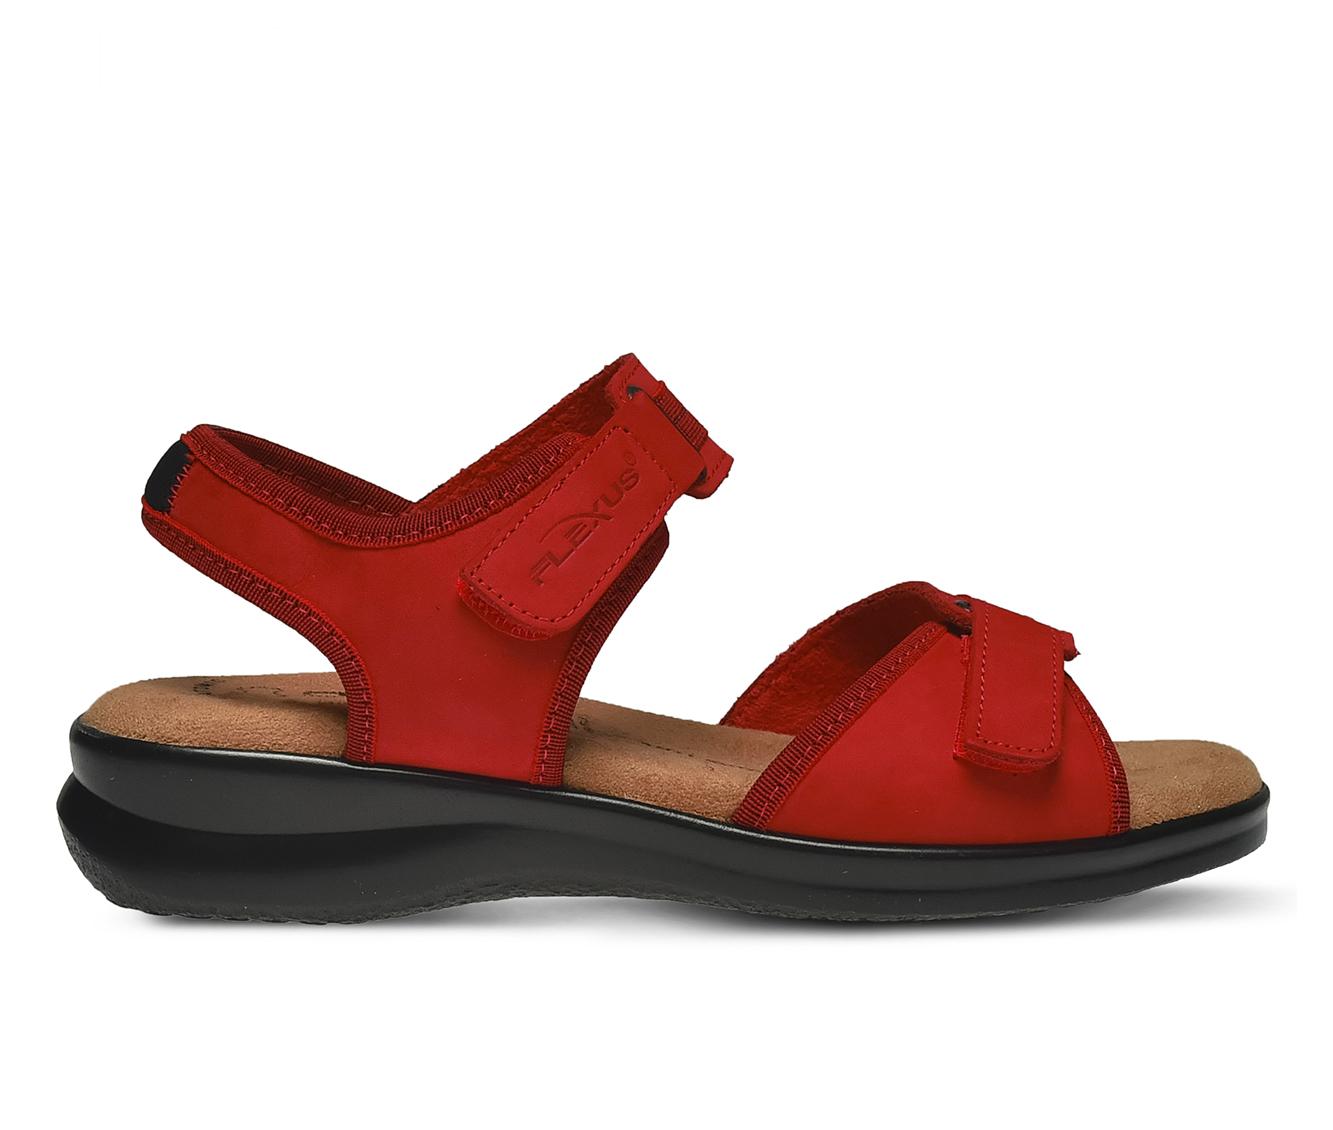 Flexus Danila Women's Sandal (Red Leather)